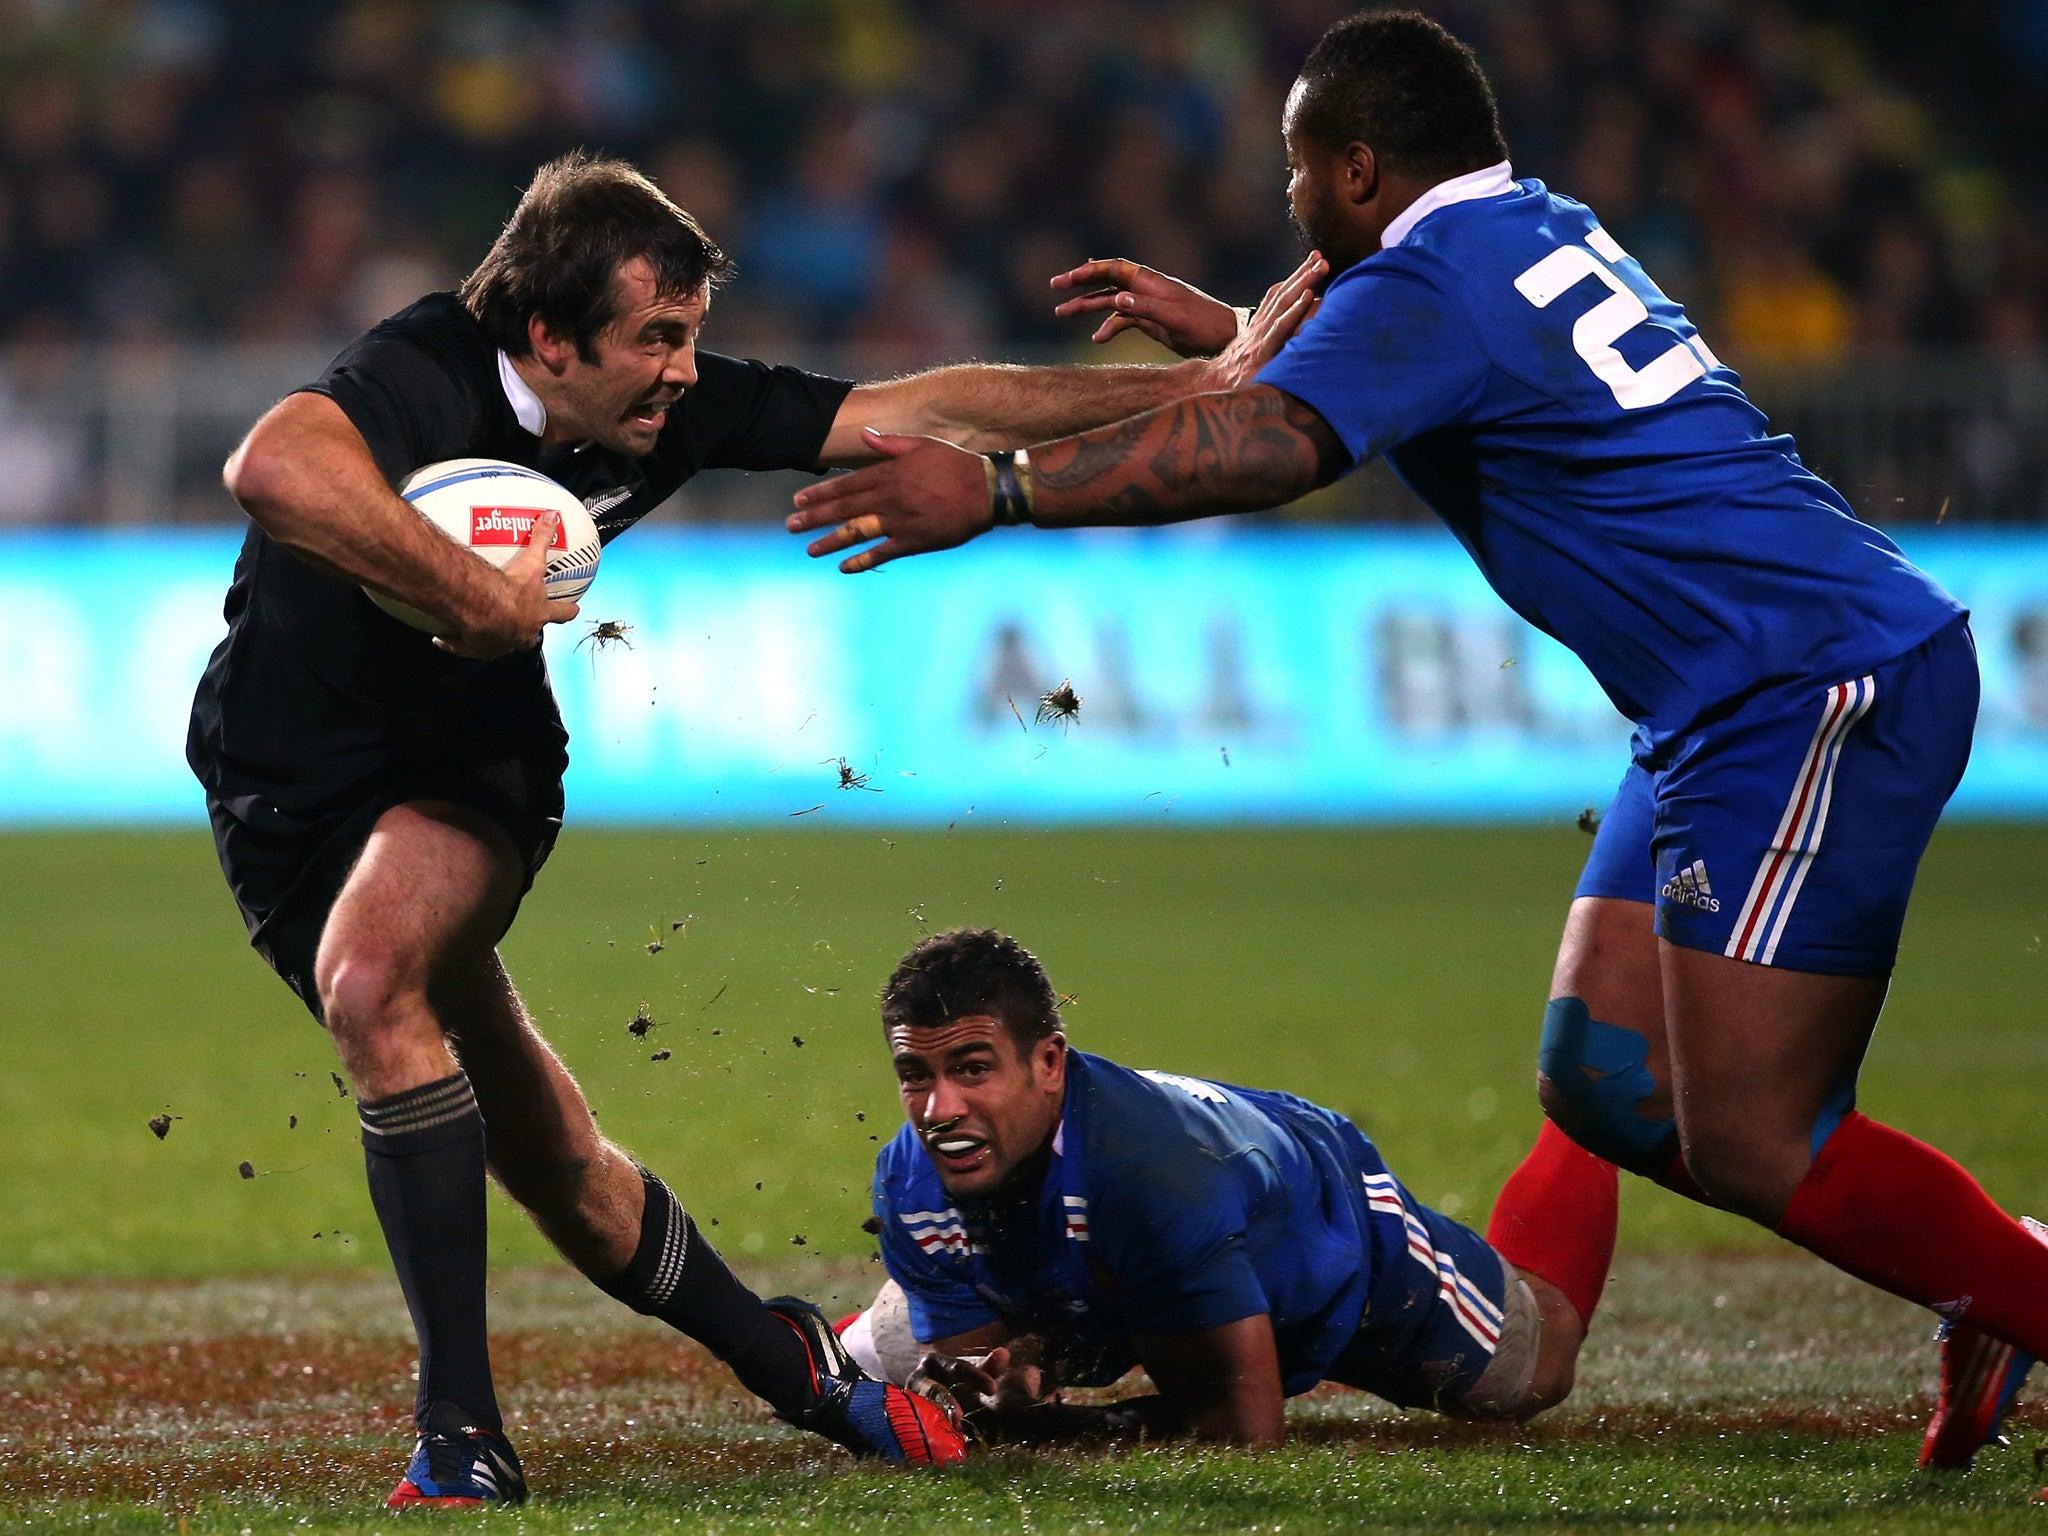 Full-time: New Zealand 62-13 France